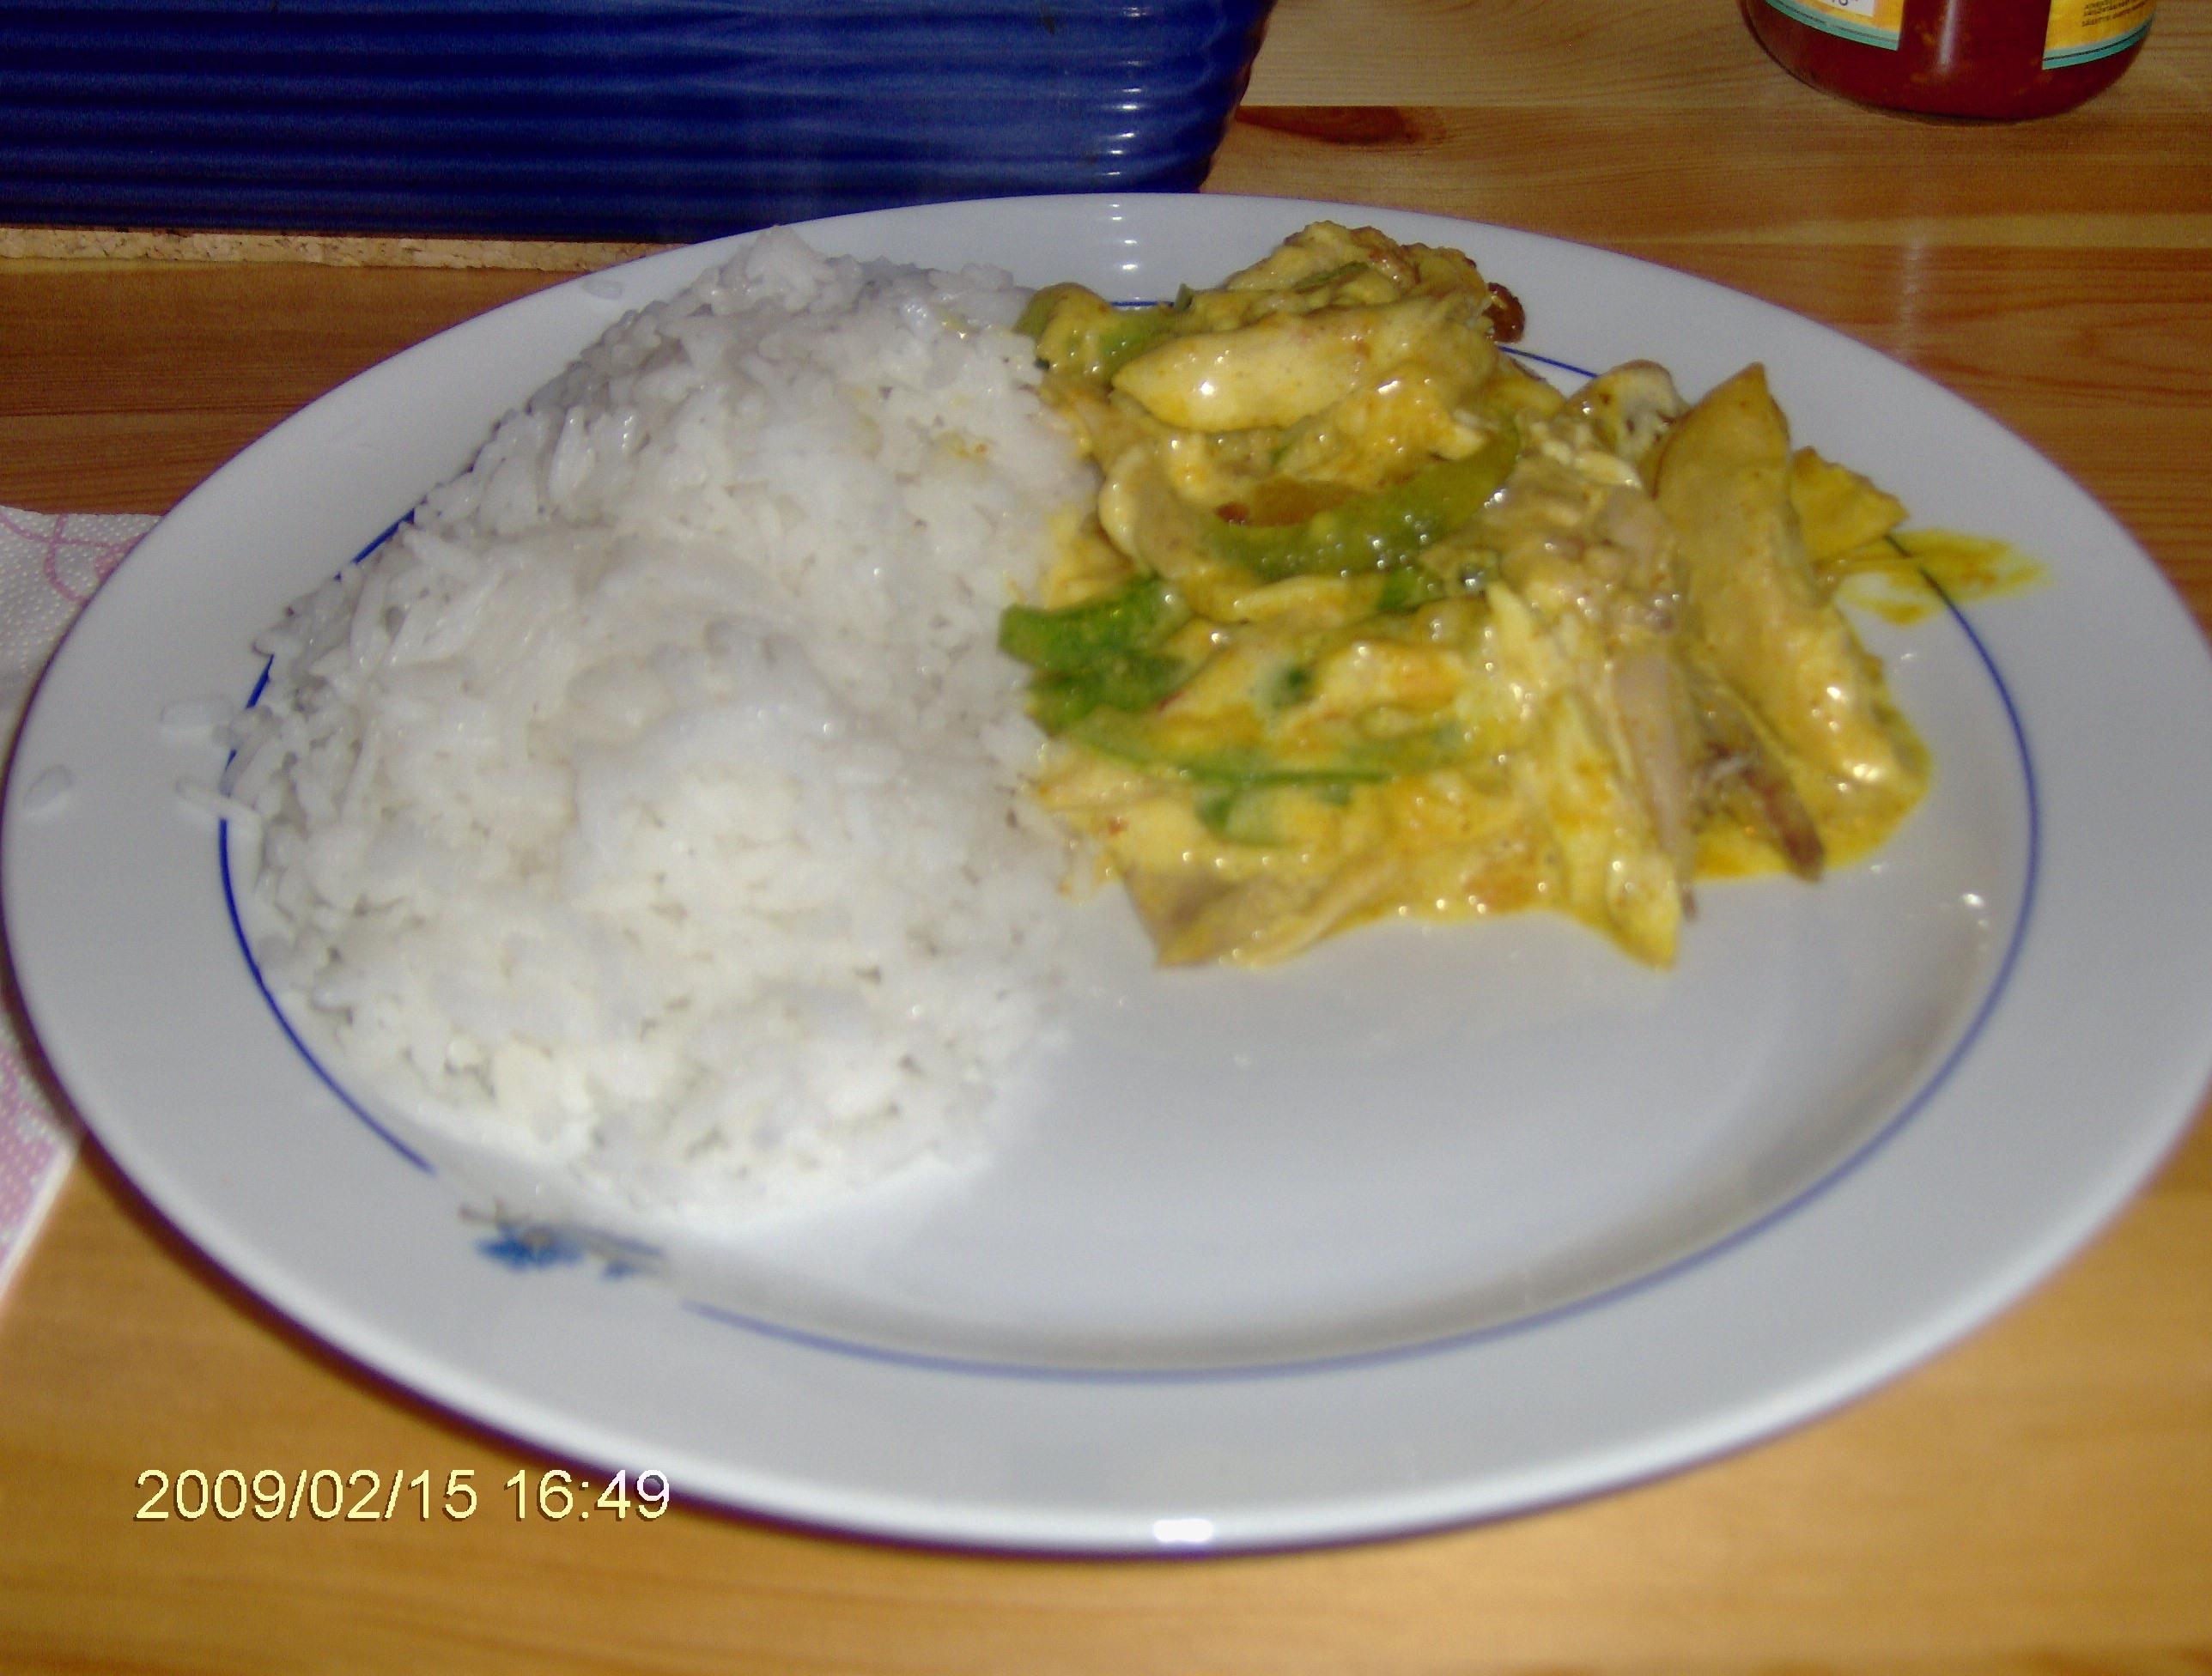 Orientalisk kyckling